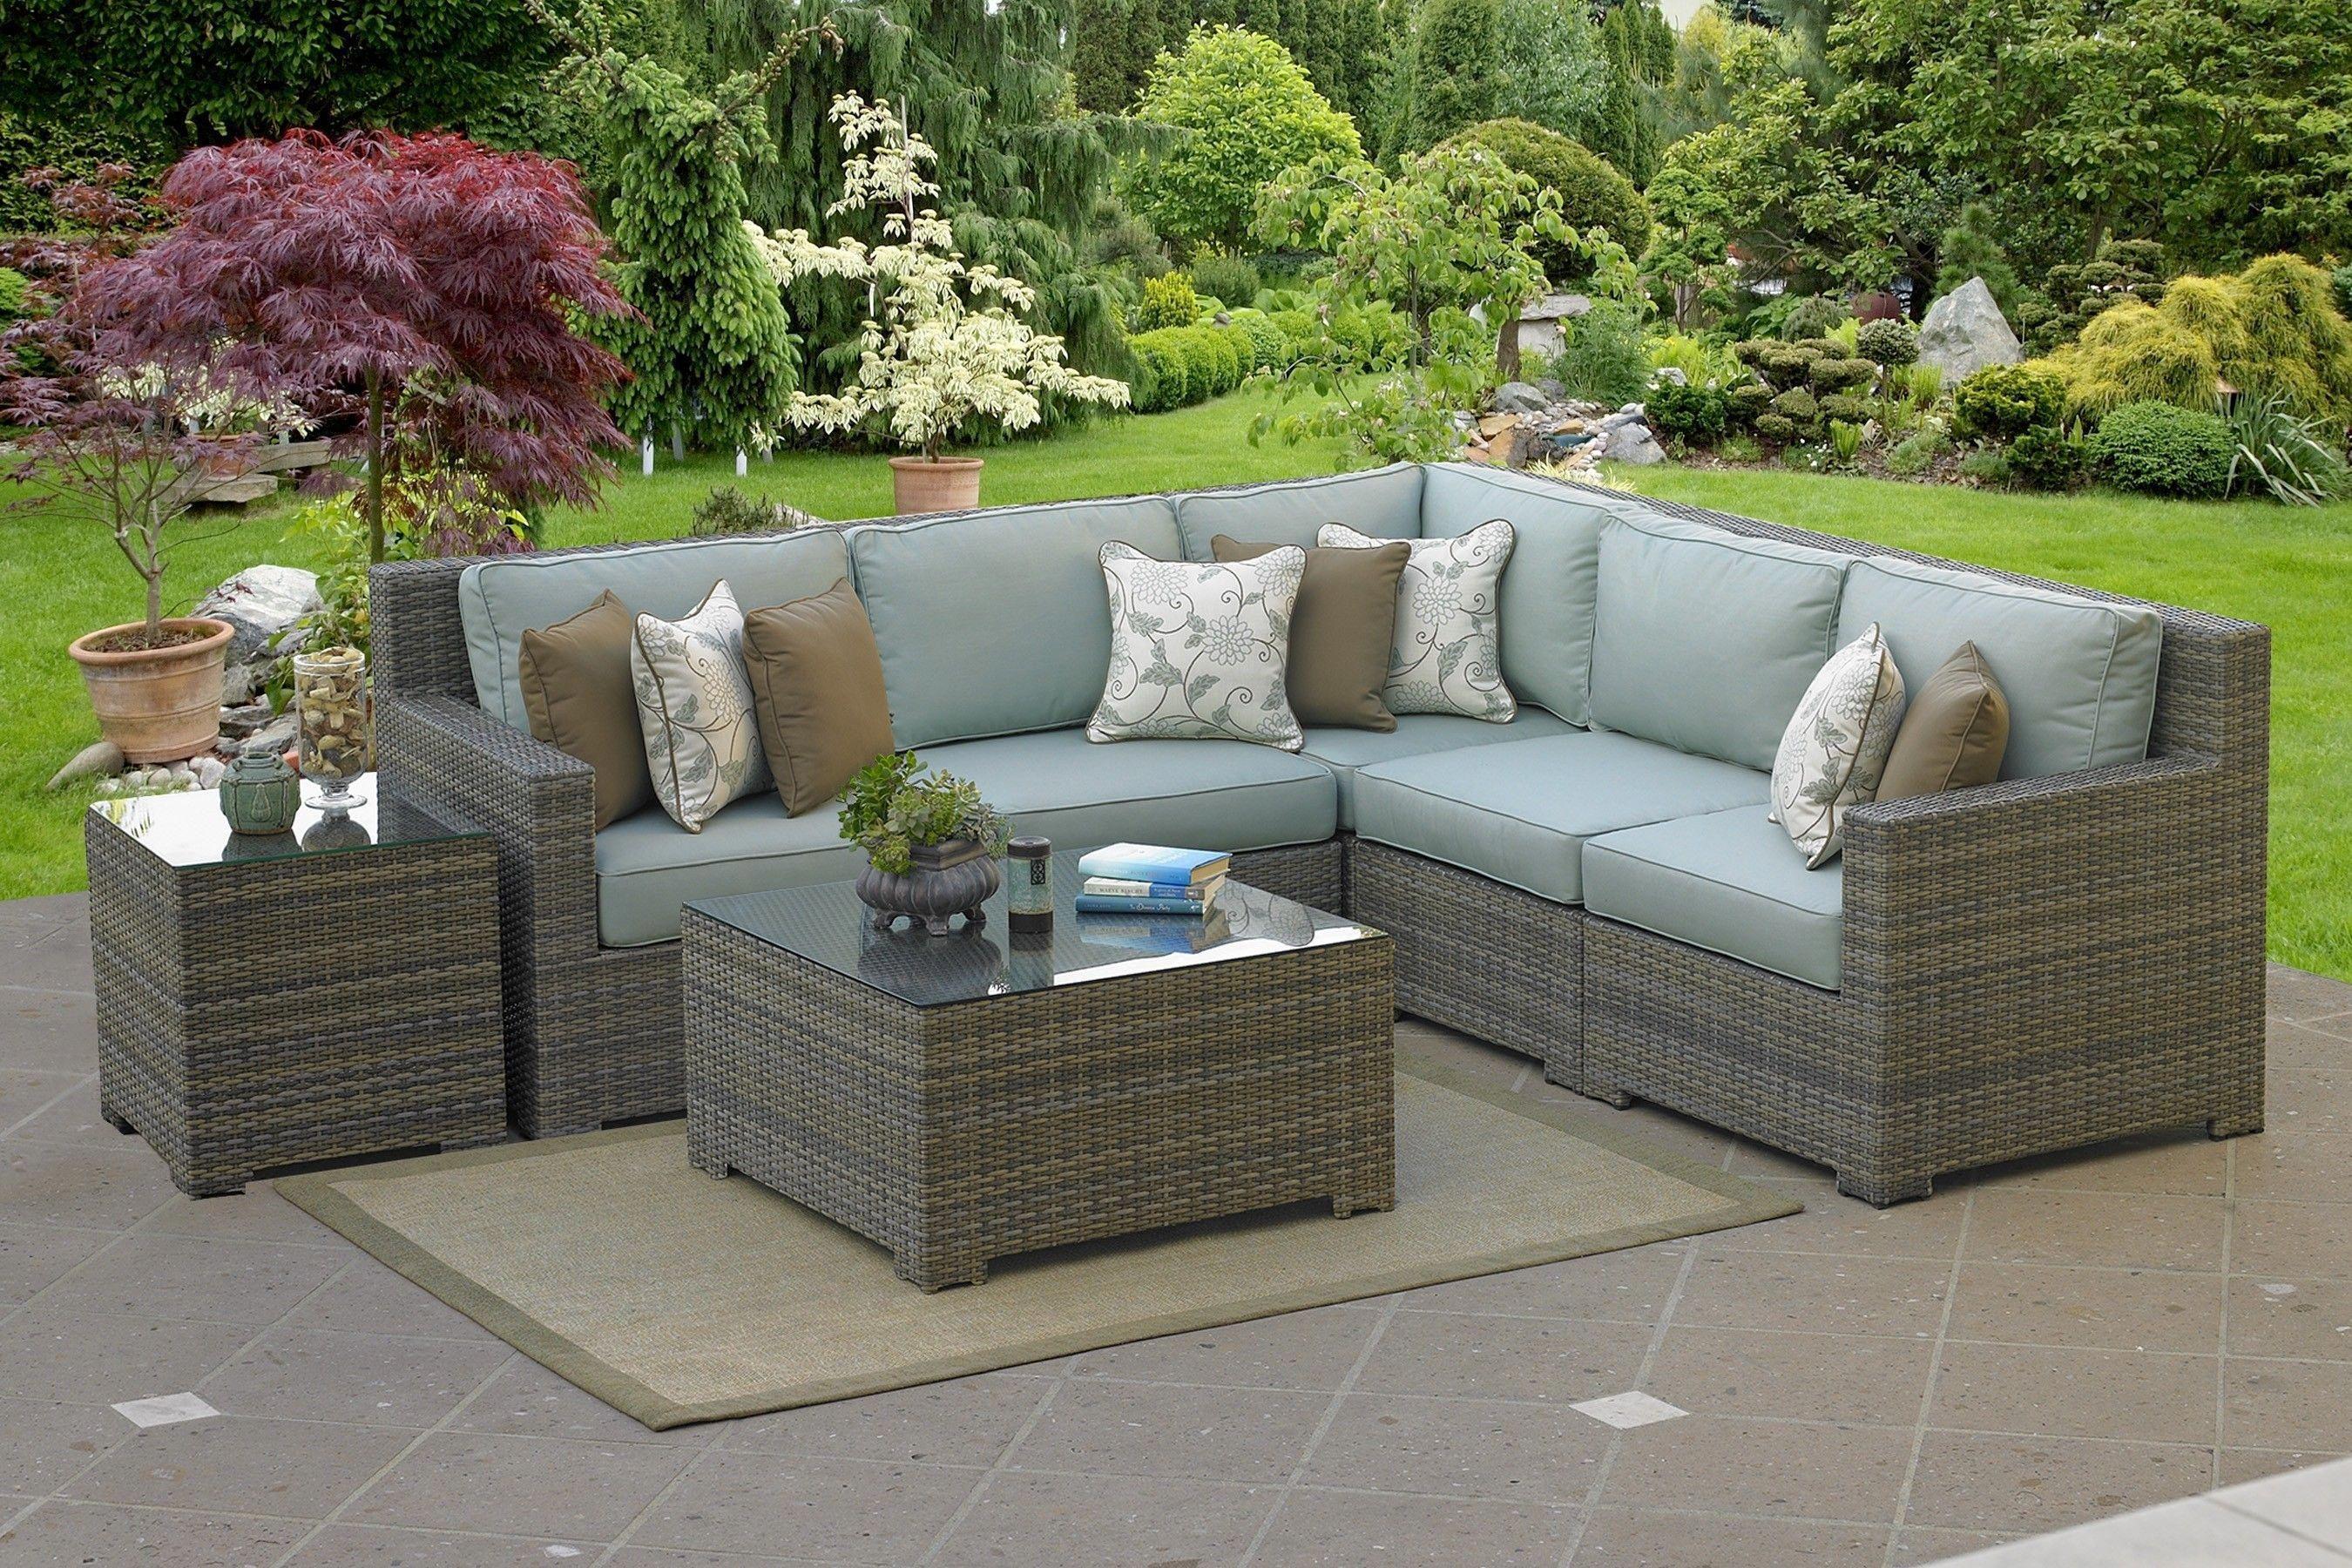 Cheapest Furniture Rental Fastfurniturerepairllc Outdoor